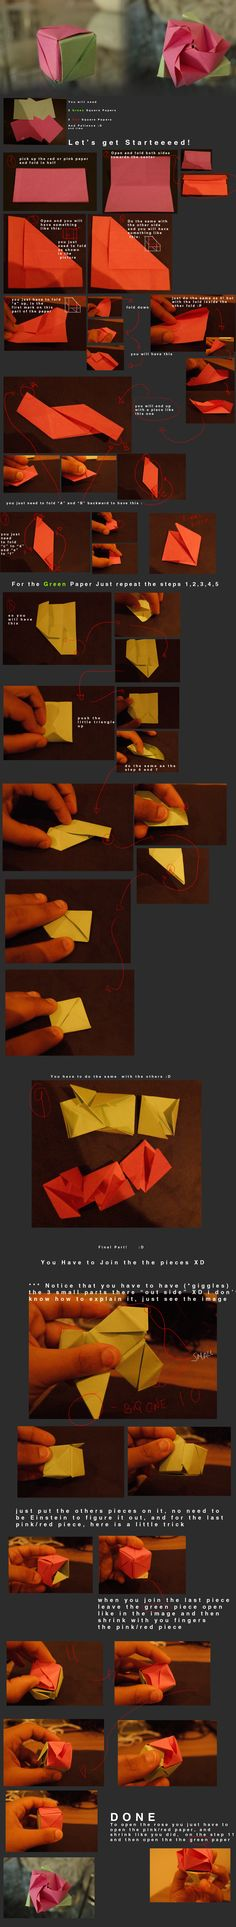 Magic Box Origami tutorial by CarlosArthur.deviantart.com